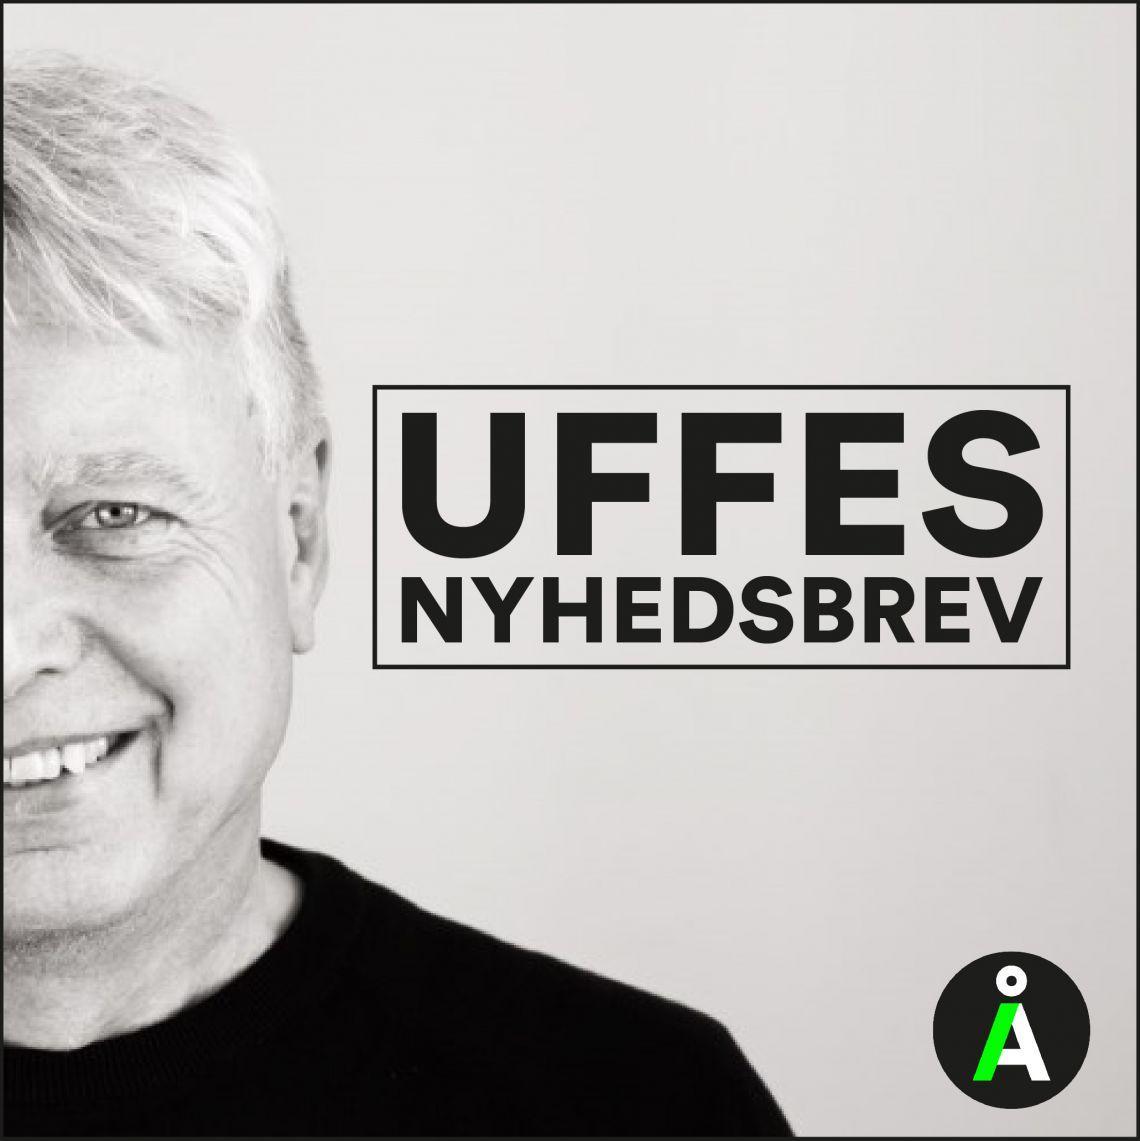 uffes_nyhedsbrev